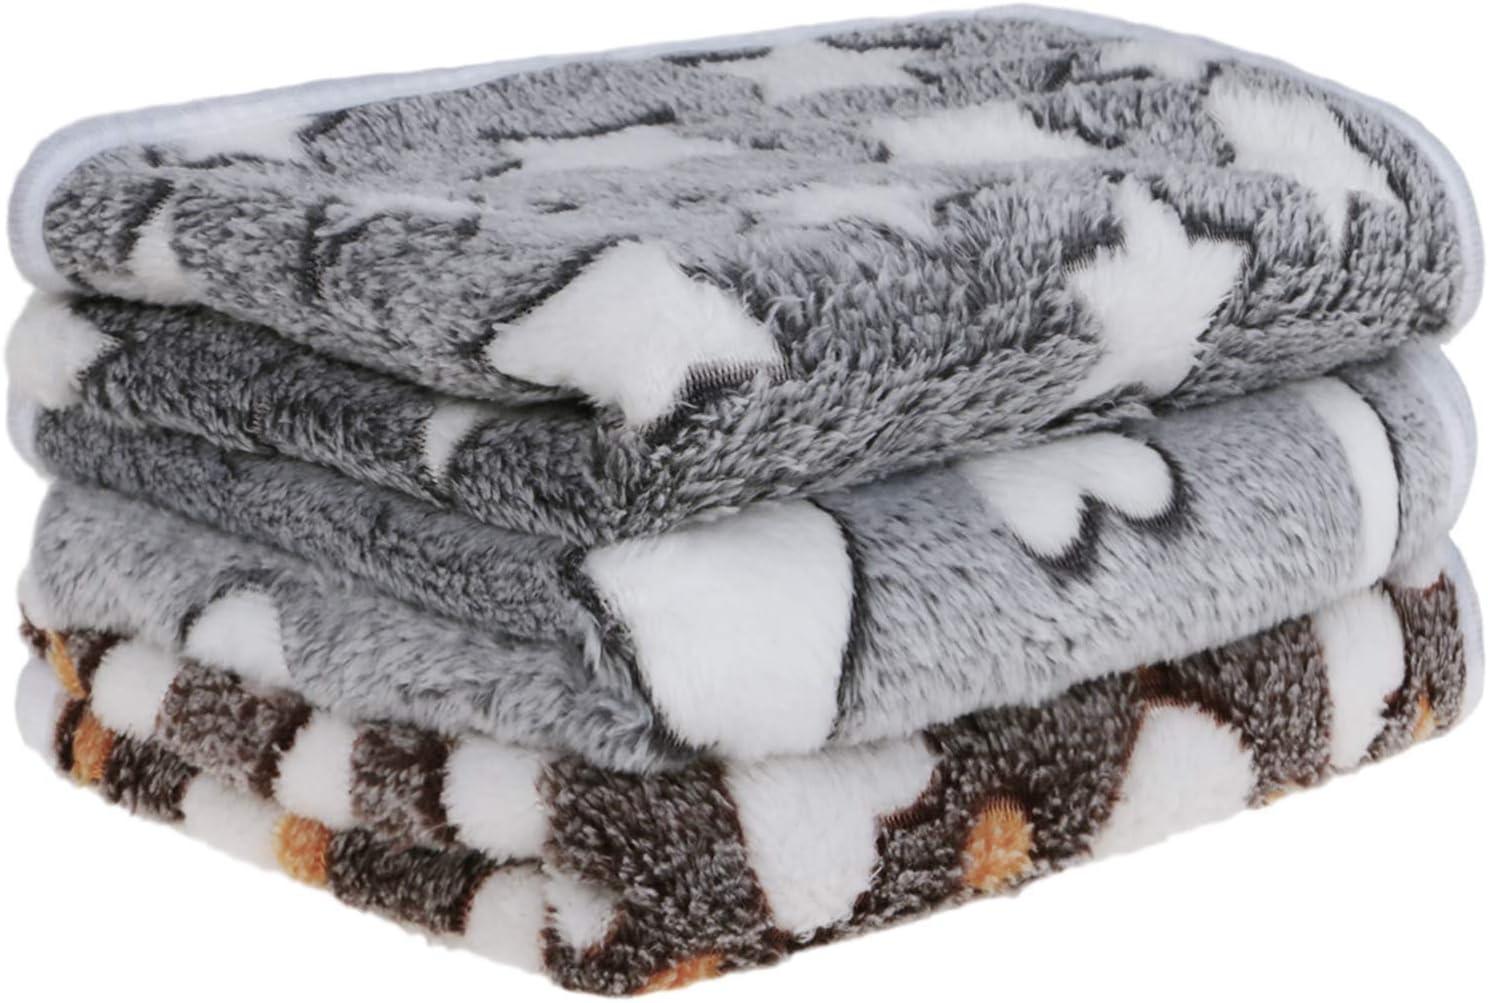 Petsvv 3 Pack Dog Blanket, Soft Fleece Flannel Throw Dog Blanket, Warm Pet Blankets for Cat & Small Dog, Grey Series : Pet Supplies